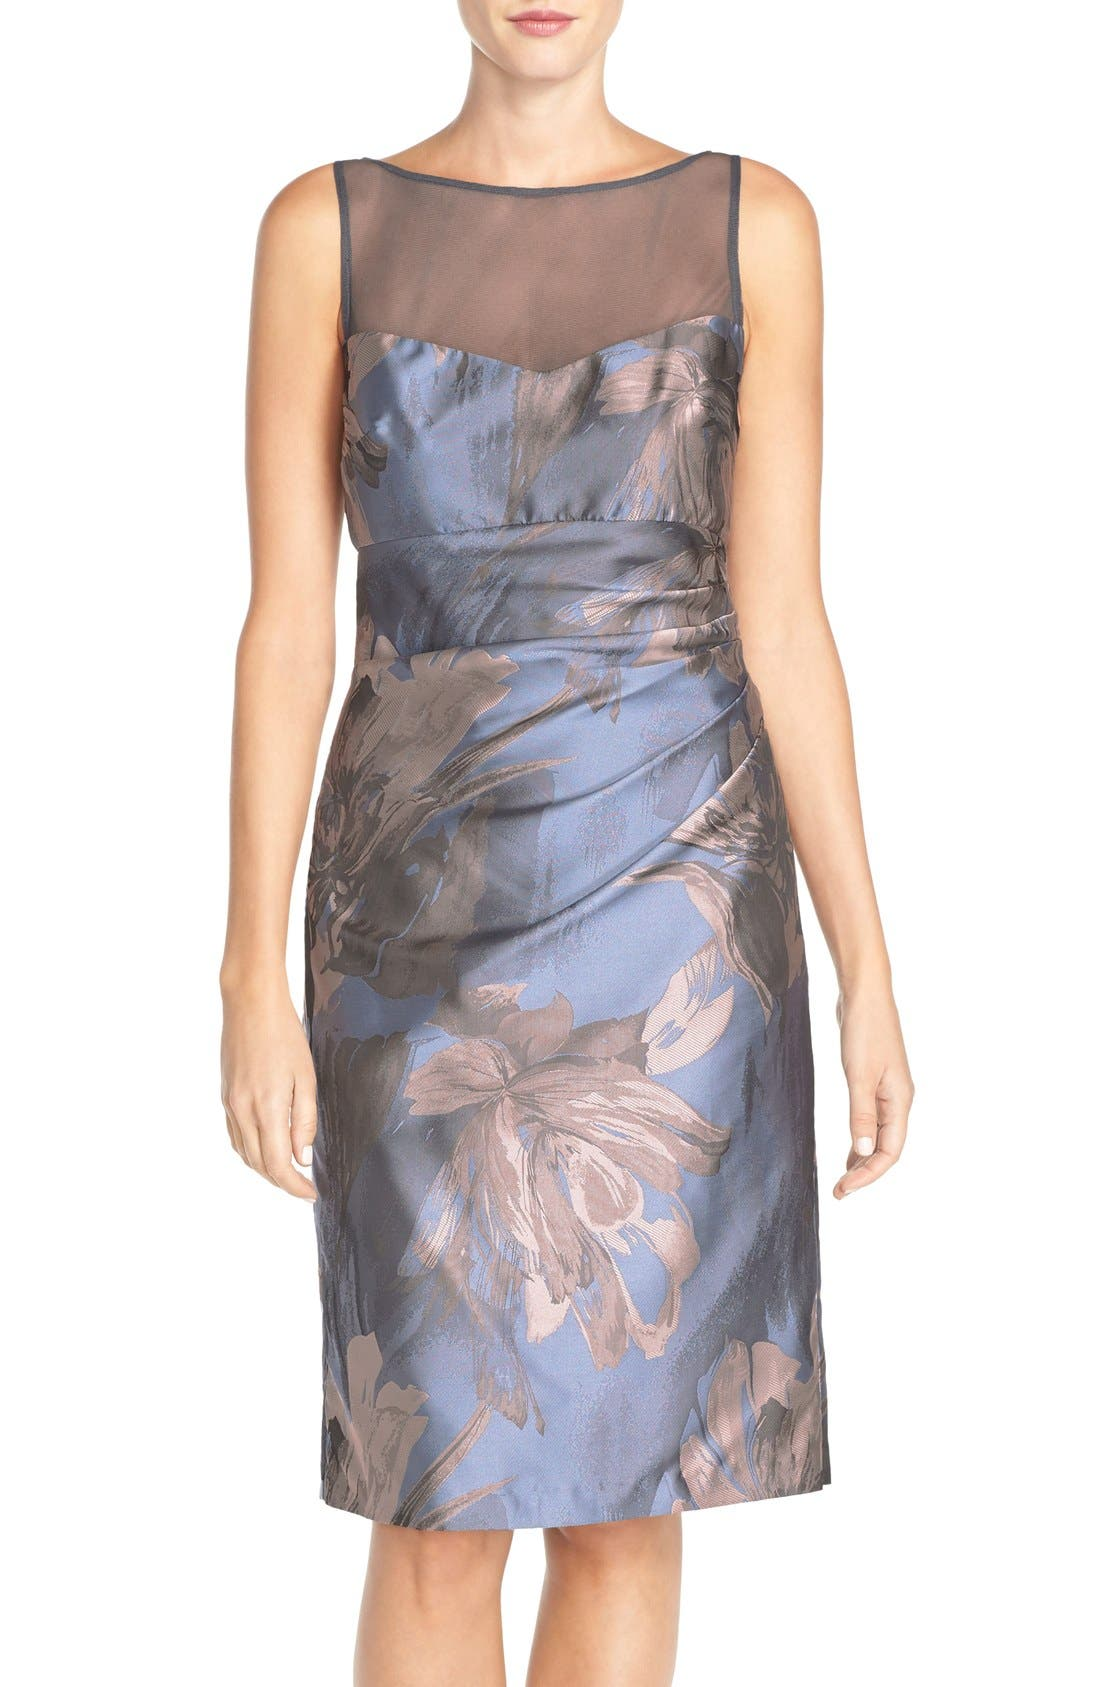 Main Image - Maggy London 'Splash' Floral Jacquard Sheath Dress (Regular & Petite)